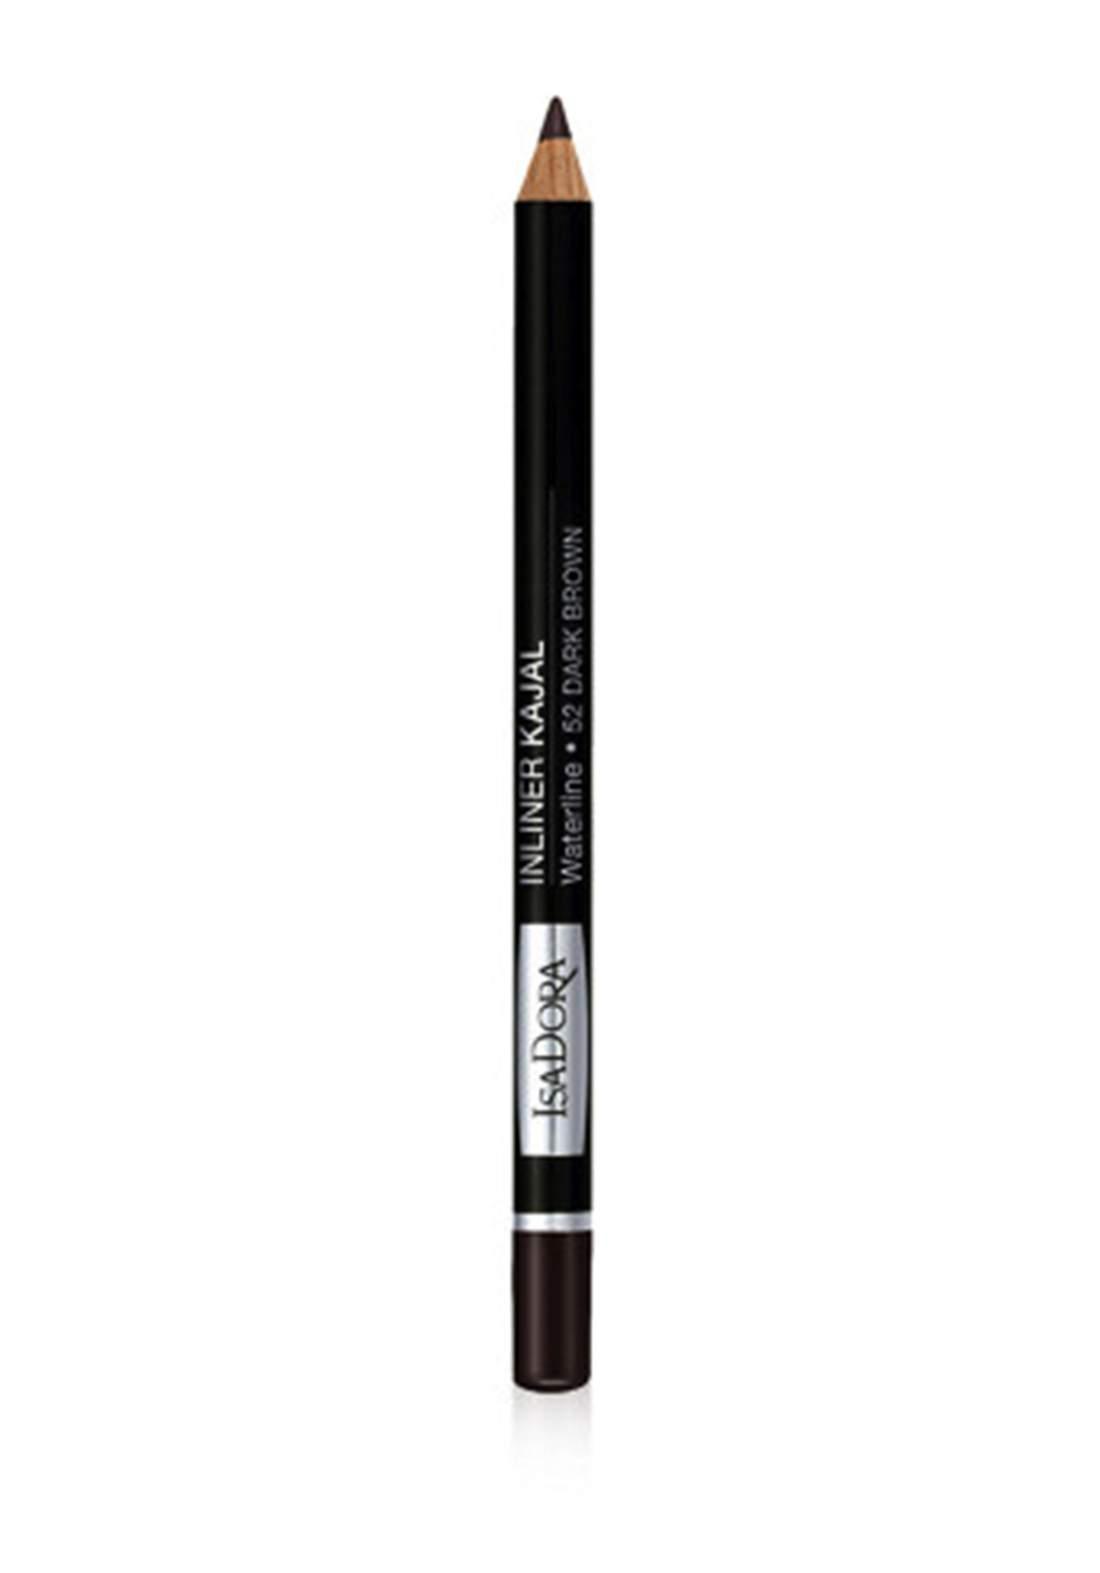 314229 Isadora Inliner Kajal Waterline No.52 Dark Brown محدد العيون